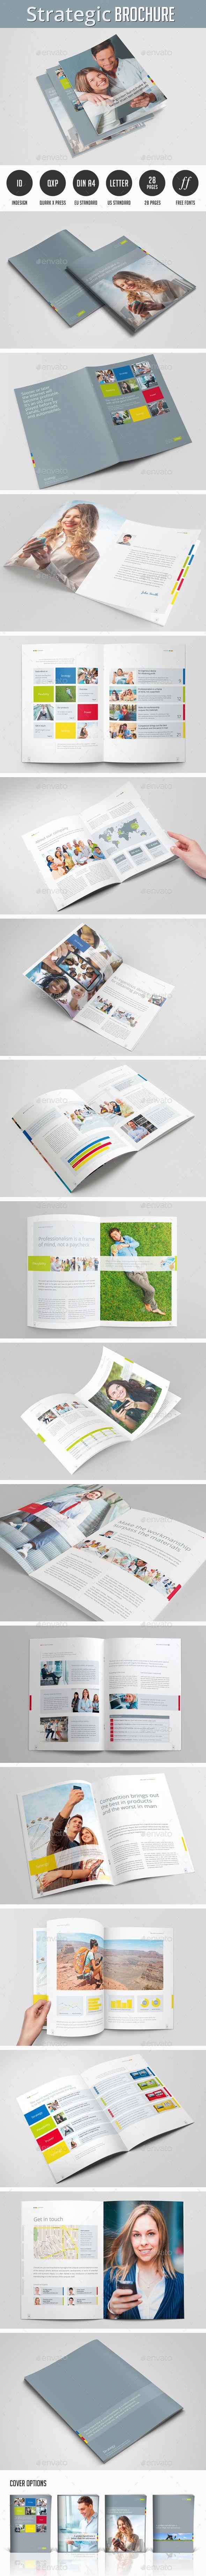 Strategic Brochure (Quark QXP, CS3, 8.27x11.69, annual report, booklet, brochure, brochure template, business brochure, catalogue, clean brochure, company brochure, company profile, corporate brochure, corporate identity, corporate report, elegant brochure, gray, magazin, minimal, mobile brochure, modern brochure, portfolio, presentation, print brochure, software, software brochure, strategic, strategic brochure, swiss brochure, template)